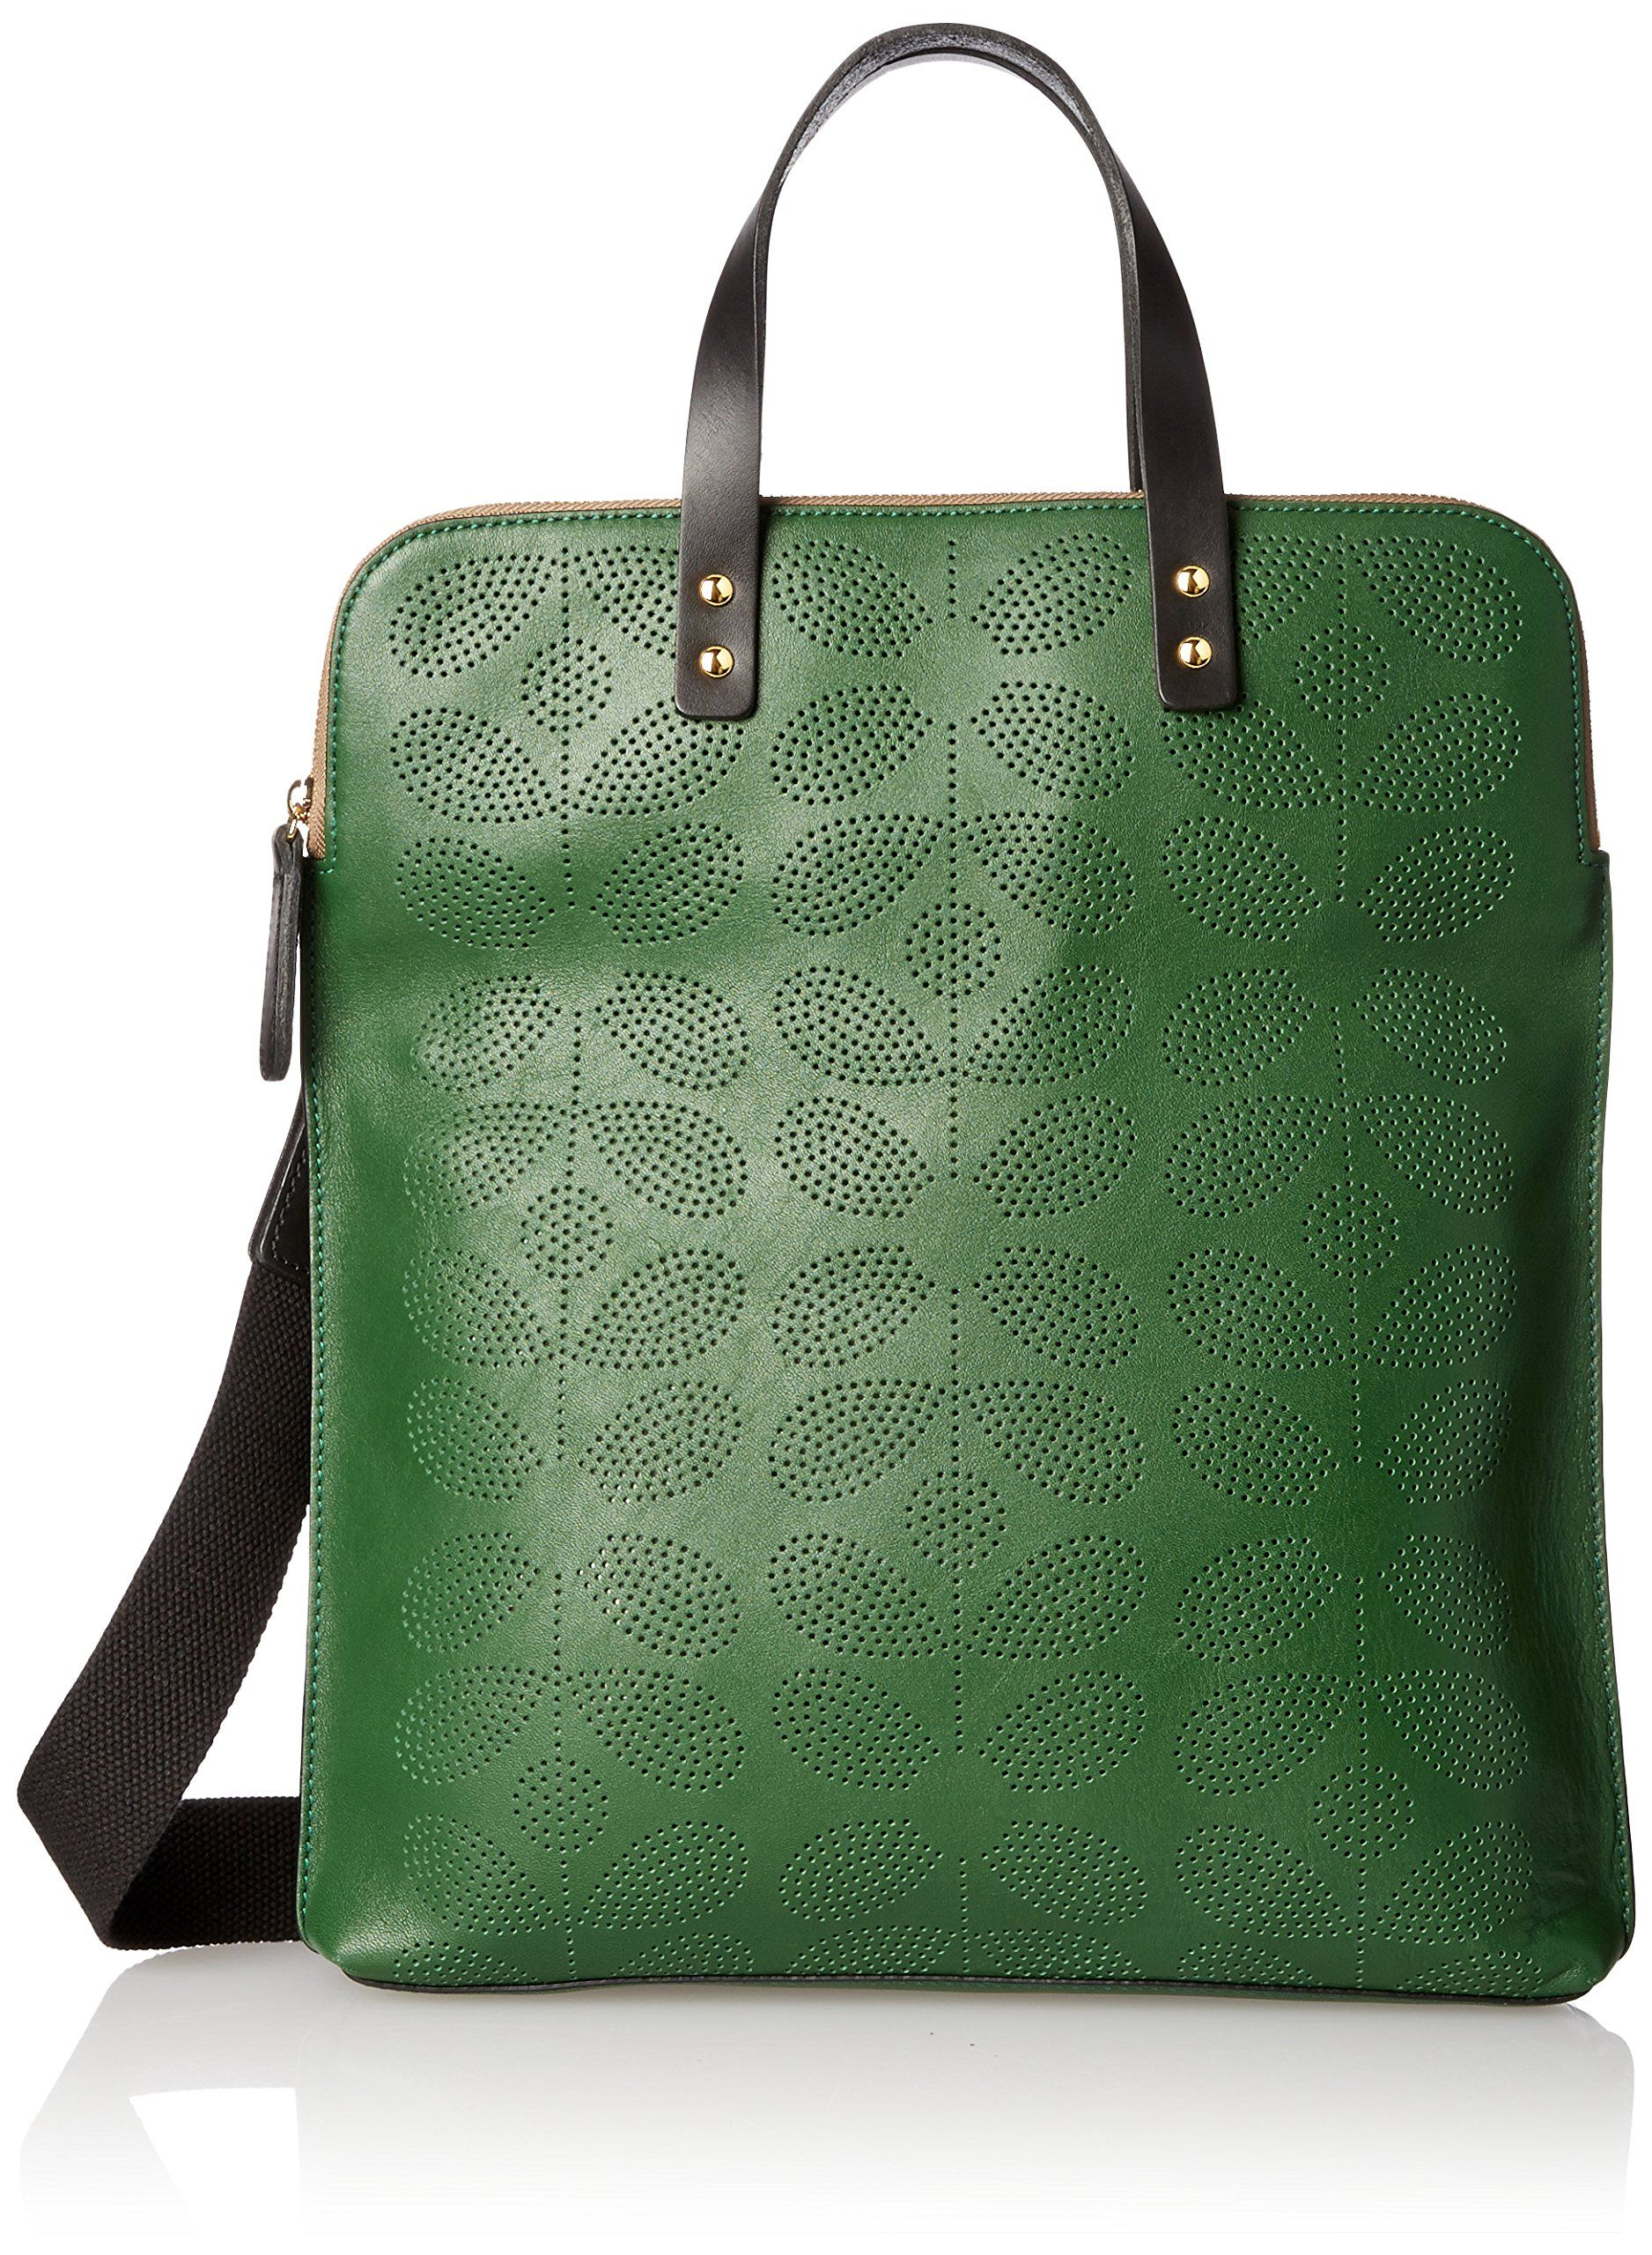 Orla Kiely Sixties Stem Punched Leather Juniper Shoulder Bag Black Clutch One Size Handbags Amazoncom